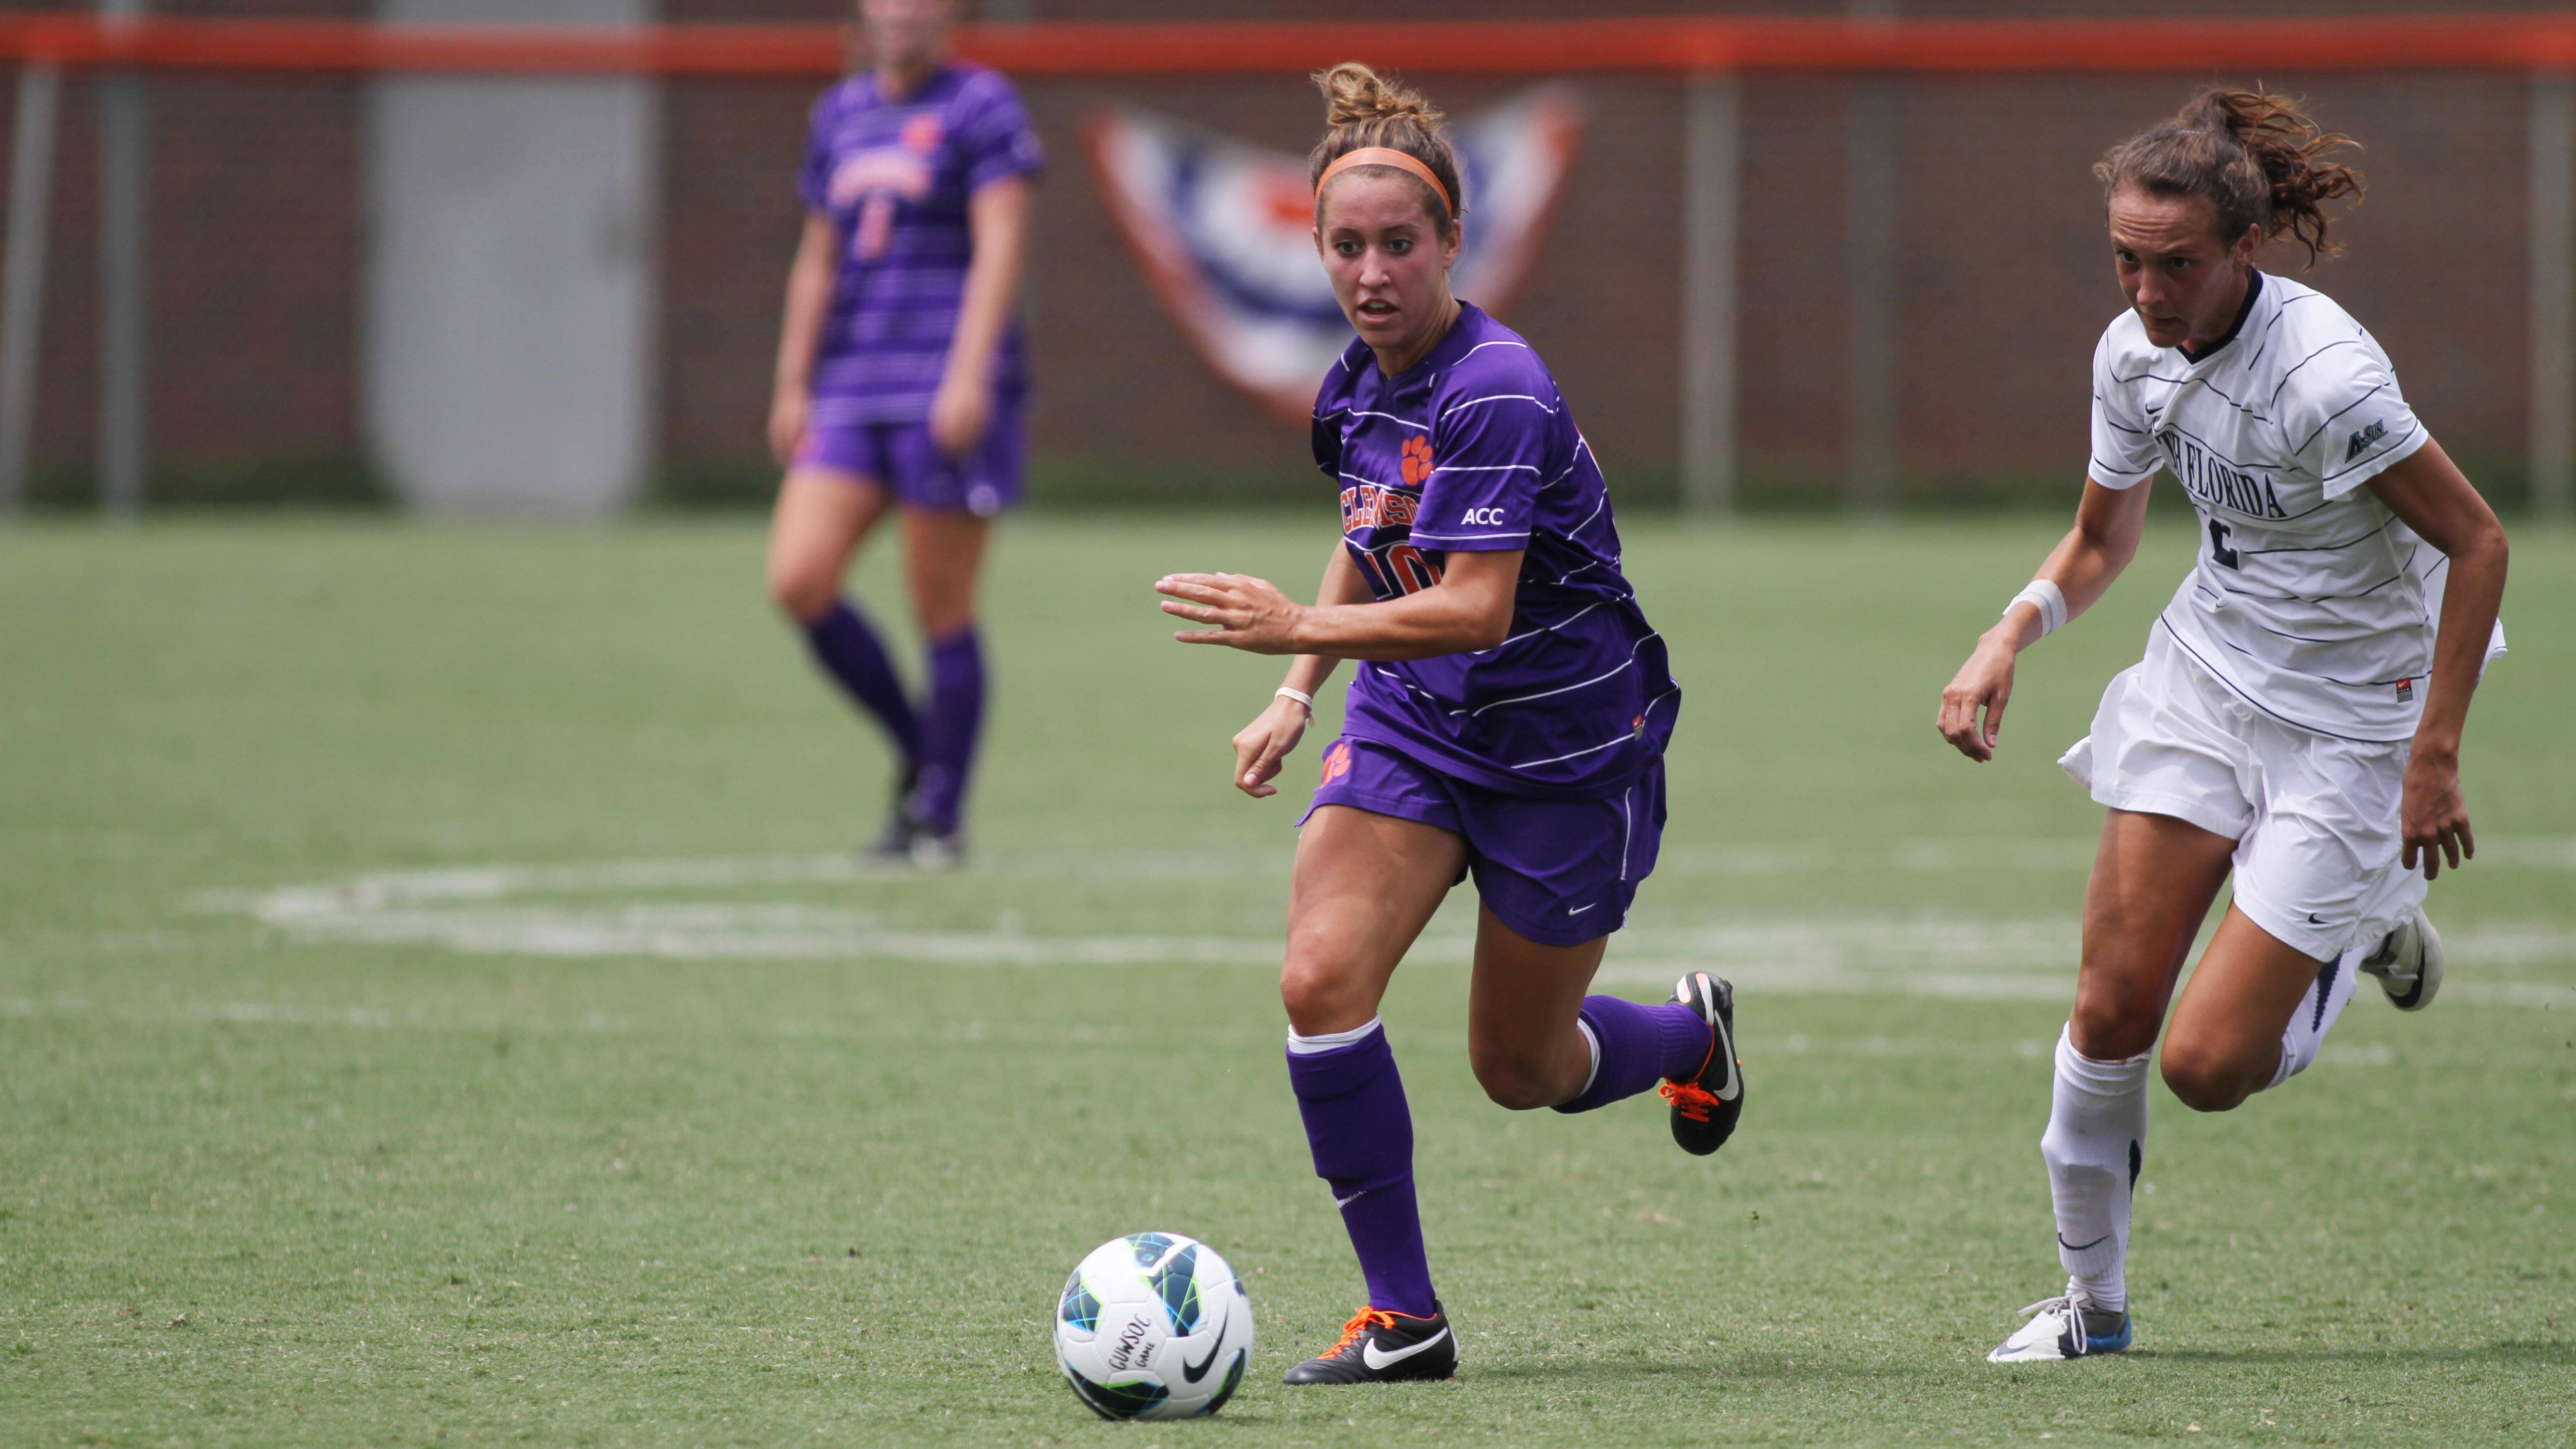 Football Game Program Feature: Women's Soccer Spotlight – Vanessa Laxgang